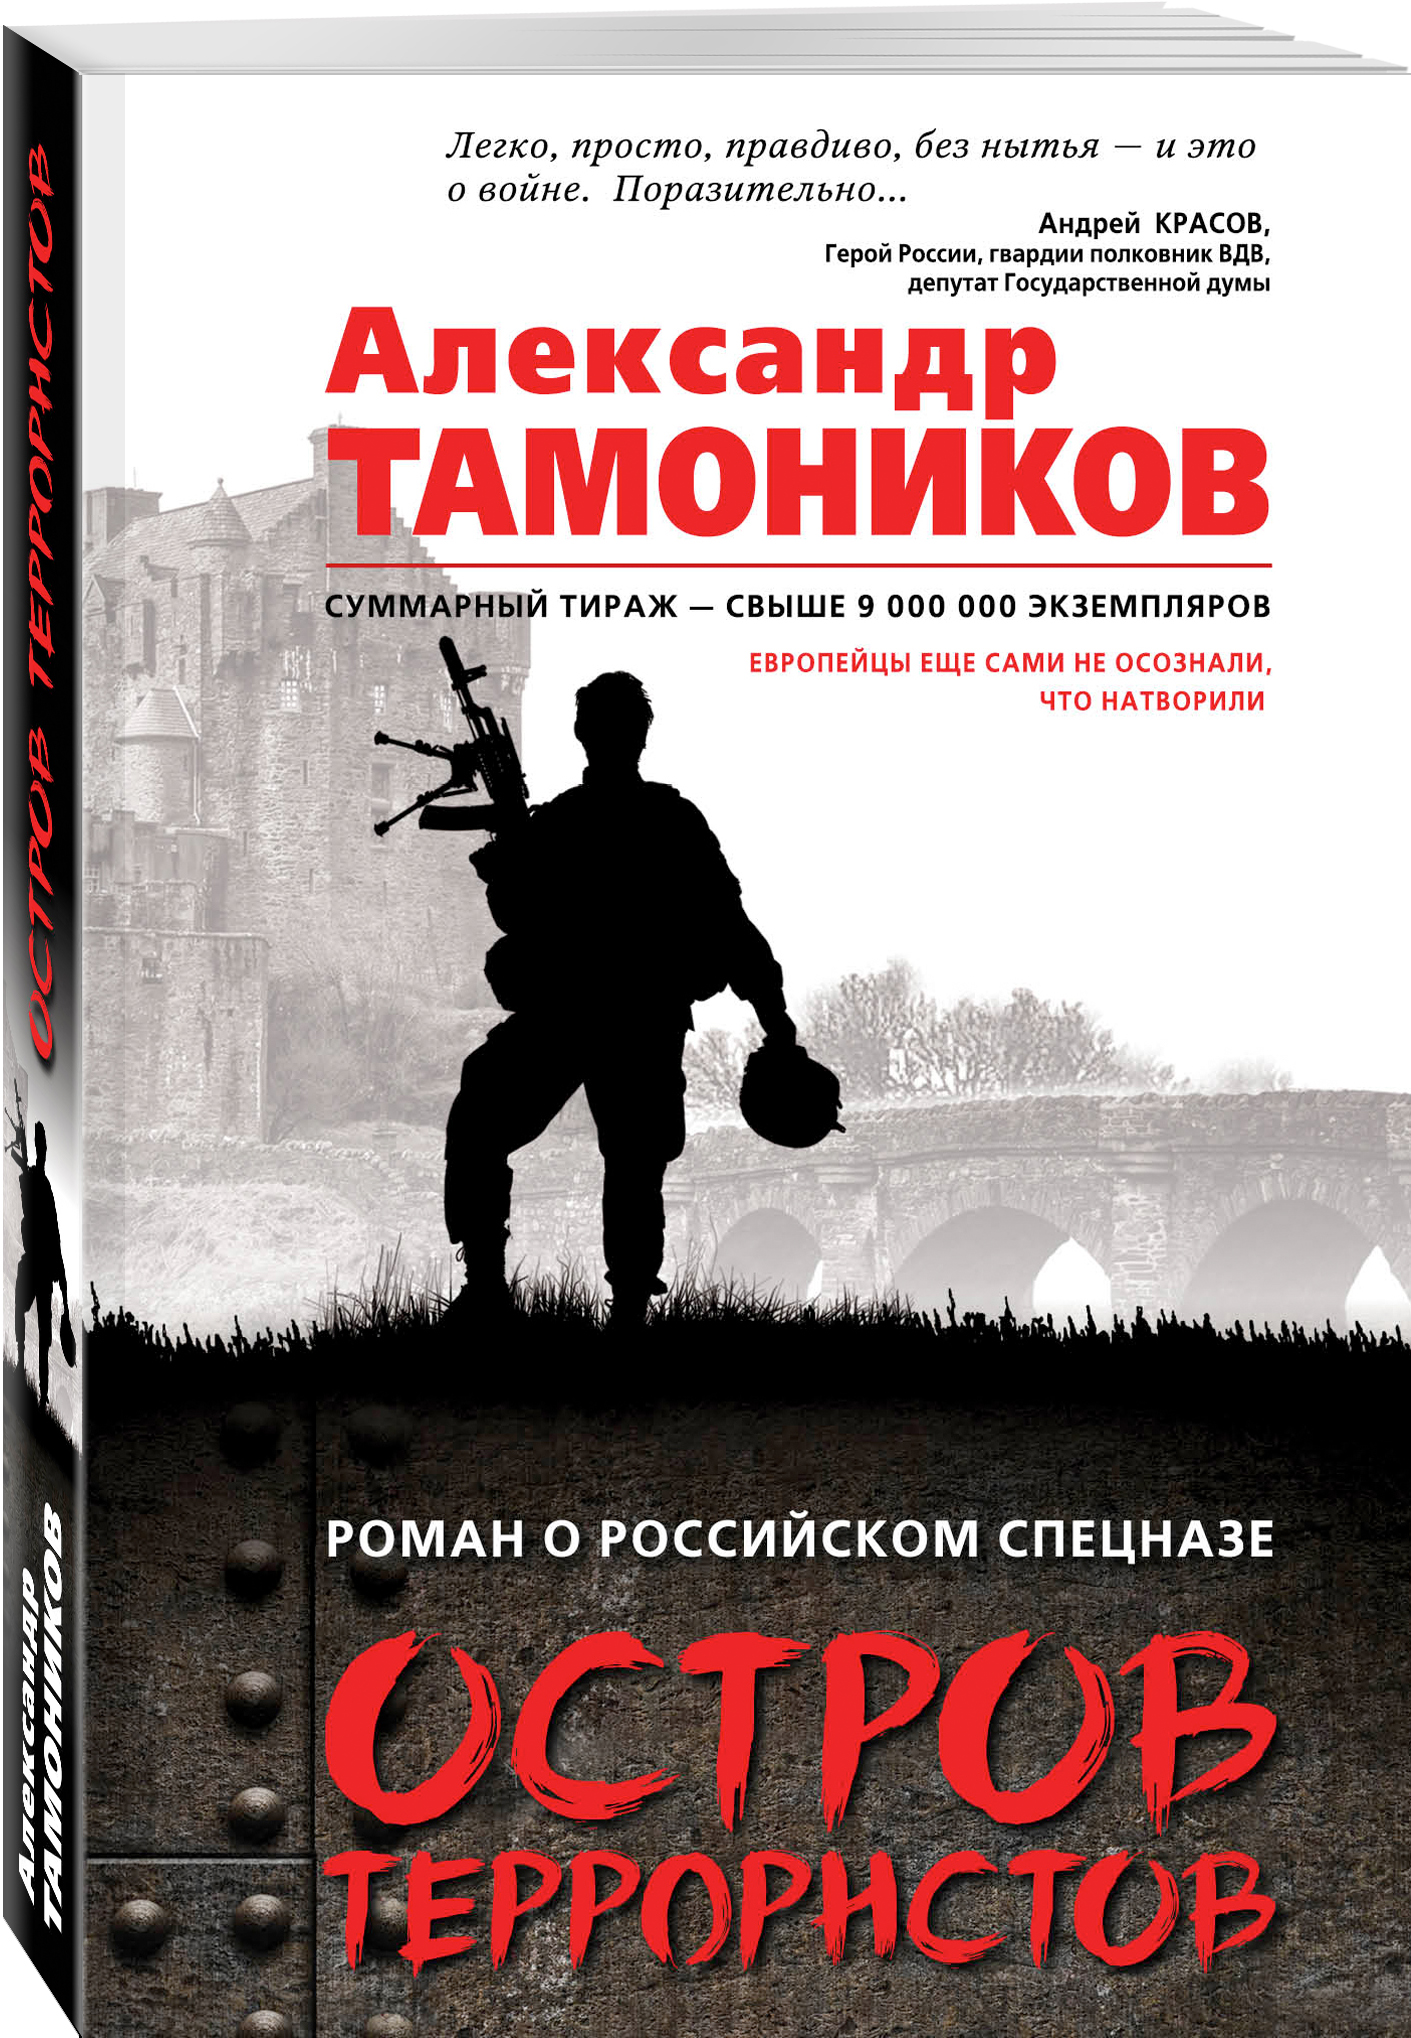 Тамоников А.А. Остров террористов